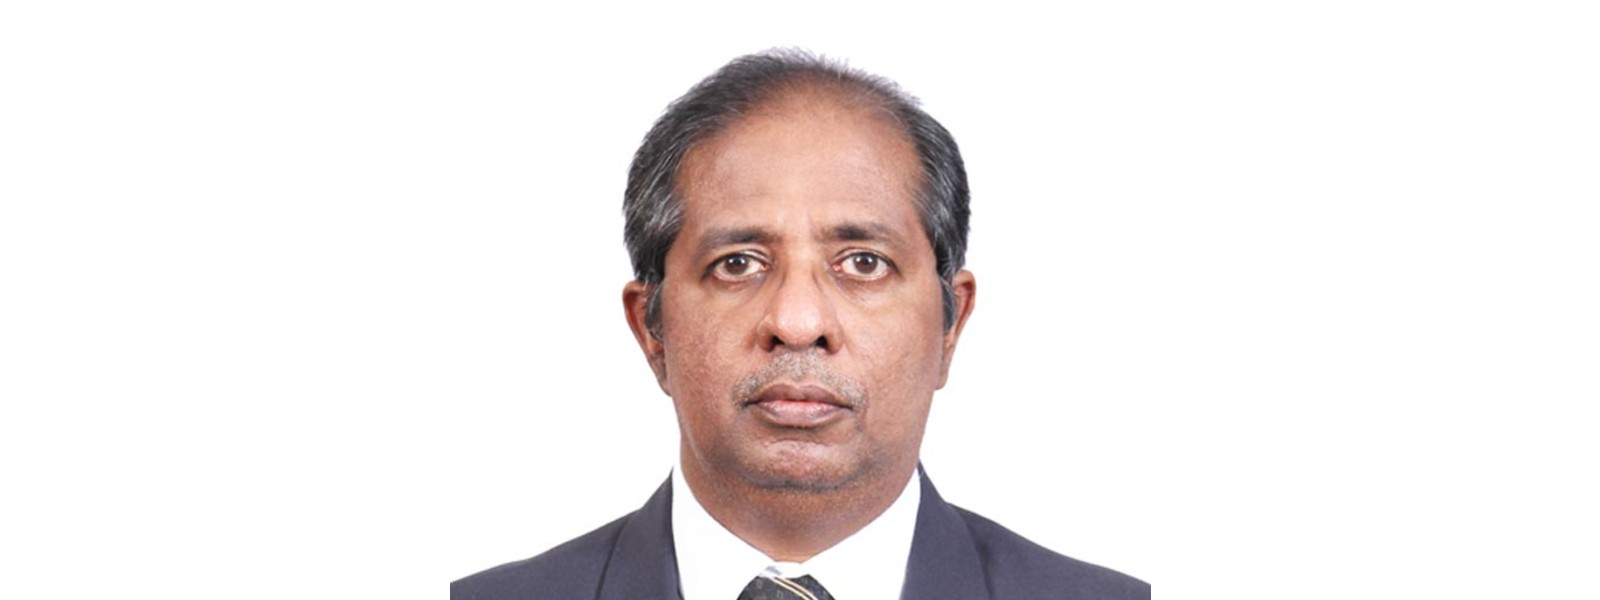 Sri Lanka's Epidemiology Chief transferred to Dengue Prevention Unit